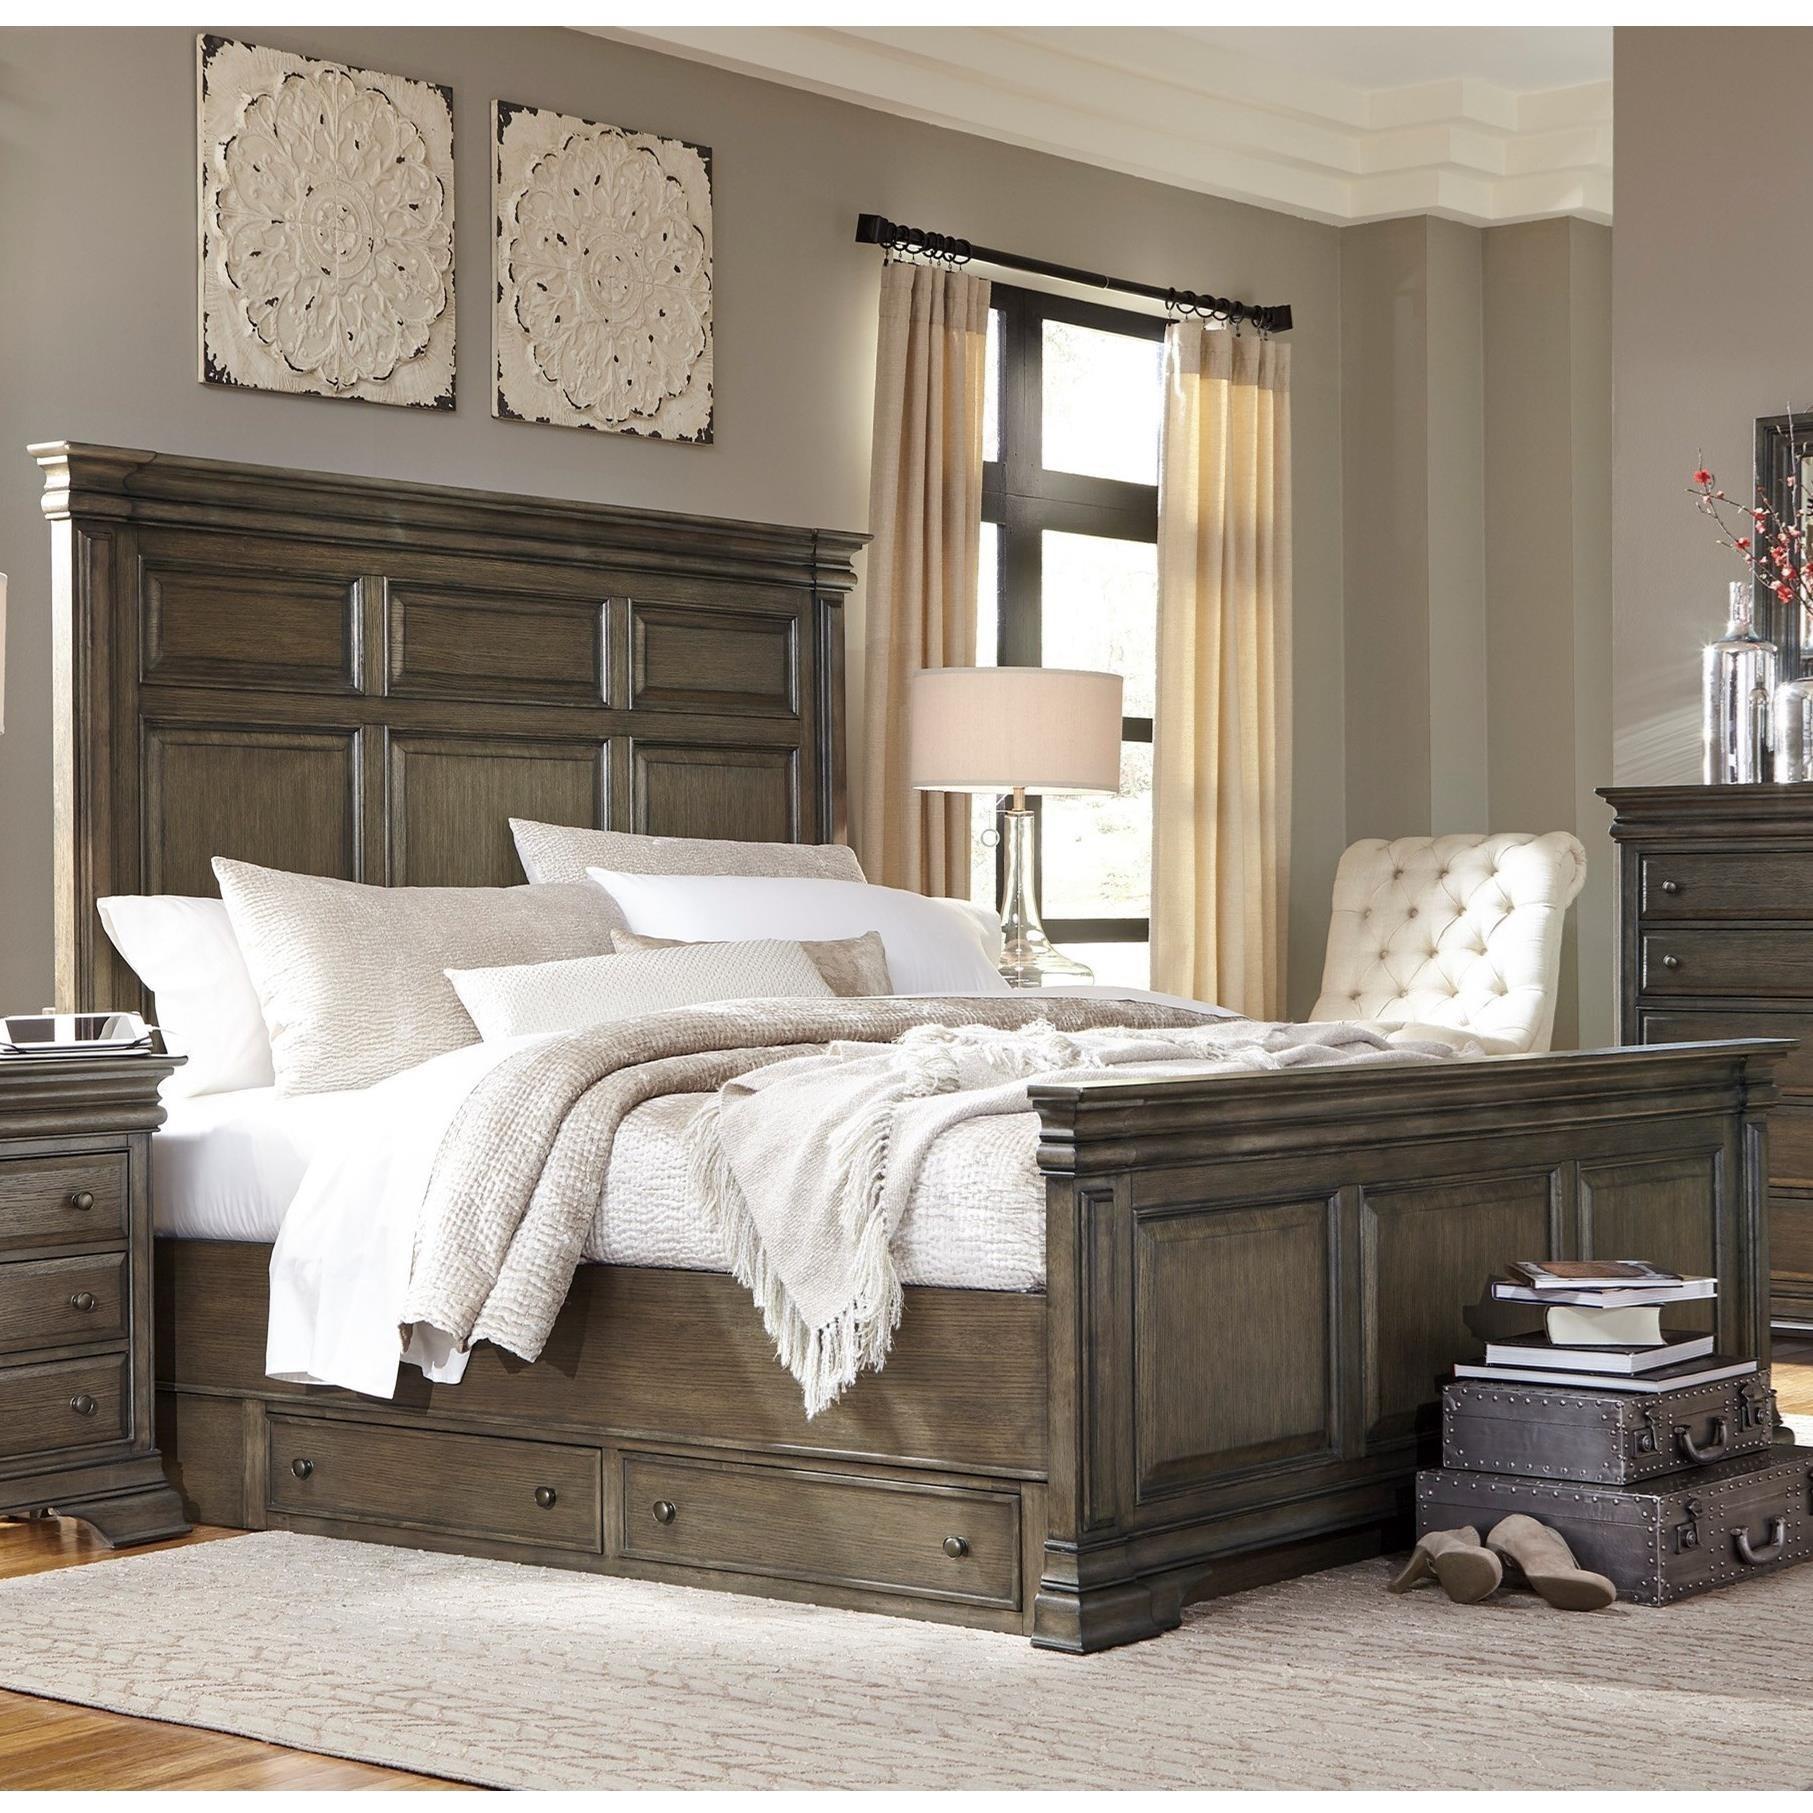 Aspenhome Arcadia Queen Panel Storage Bed  - Item Number: I92-412-413-402-497